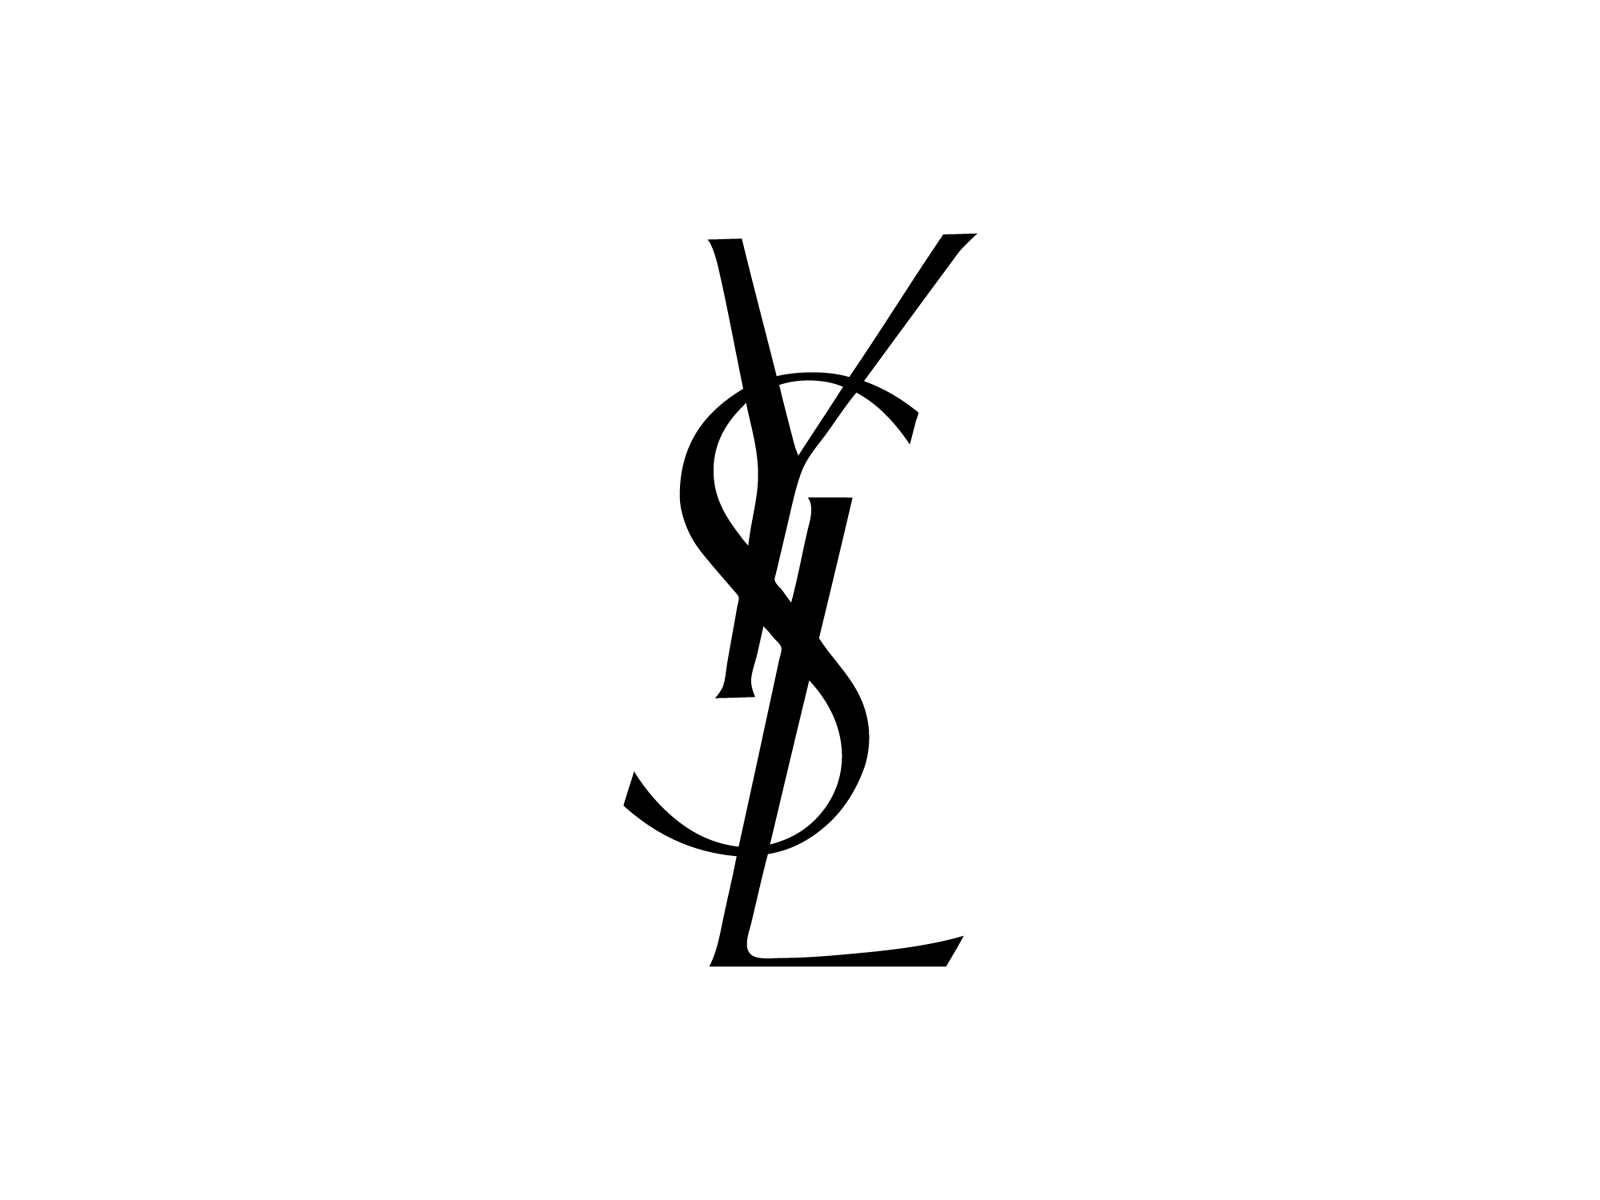 yves saint laurent logo transparent png stickpng